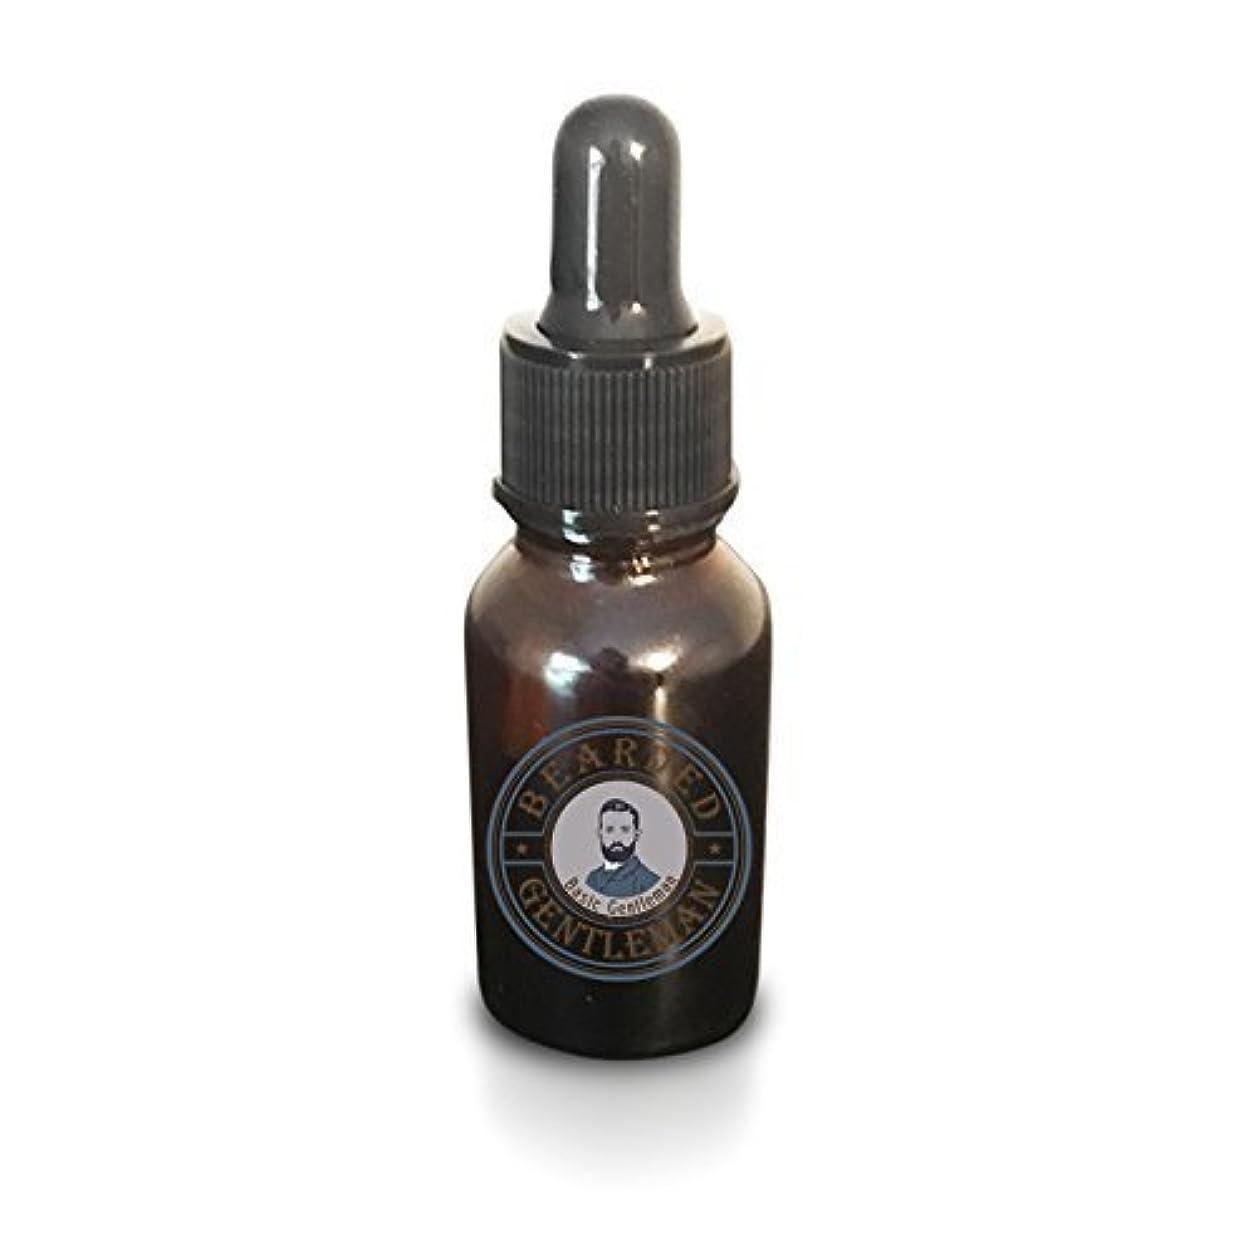 犯罪聴衆罹患率Beard Oil by Bearded Gentleman: Unscented | All Natural Beard Conditioning Oil | 30 ml | Handmade [並行輸入品]